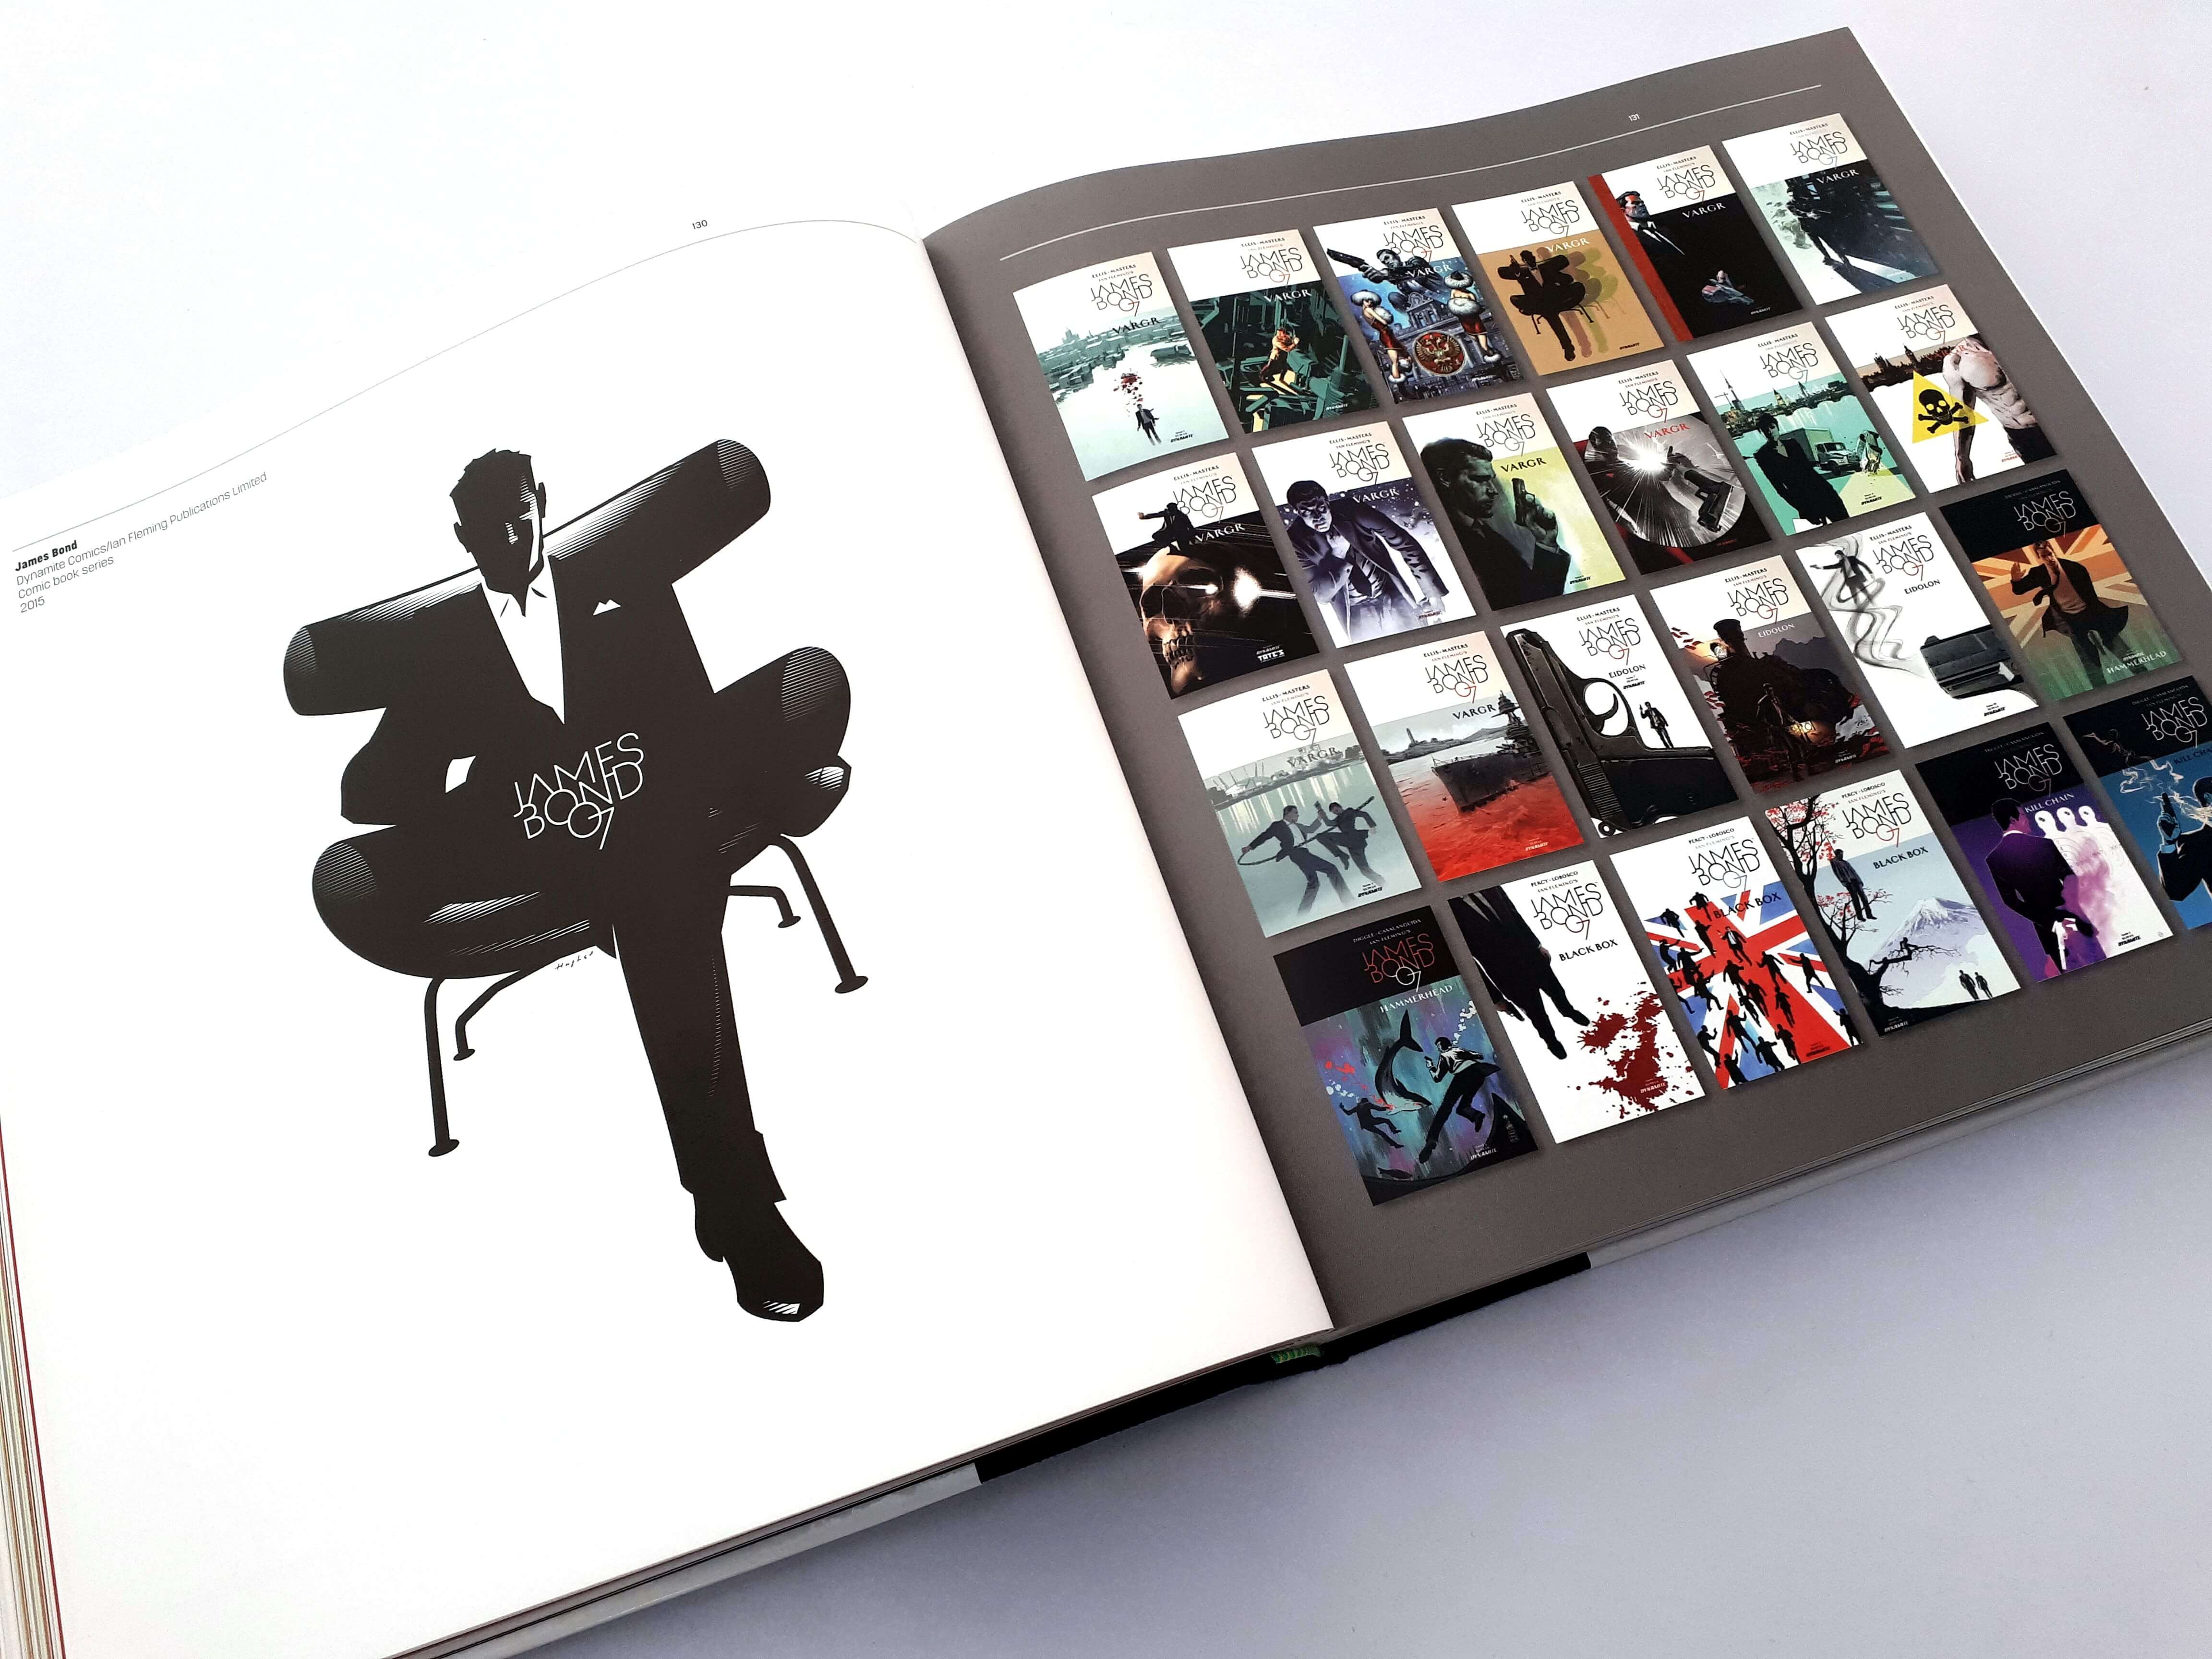 Logo-a-gogo By Rian Hughes